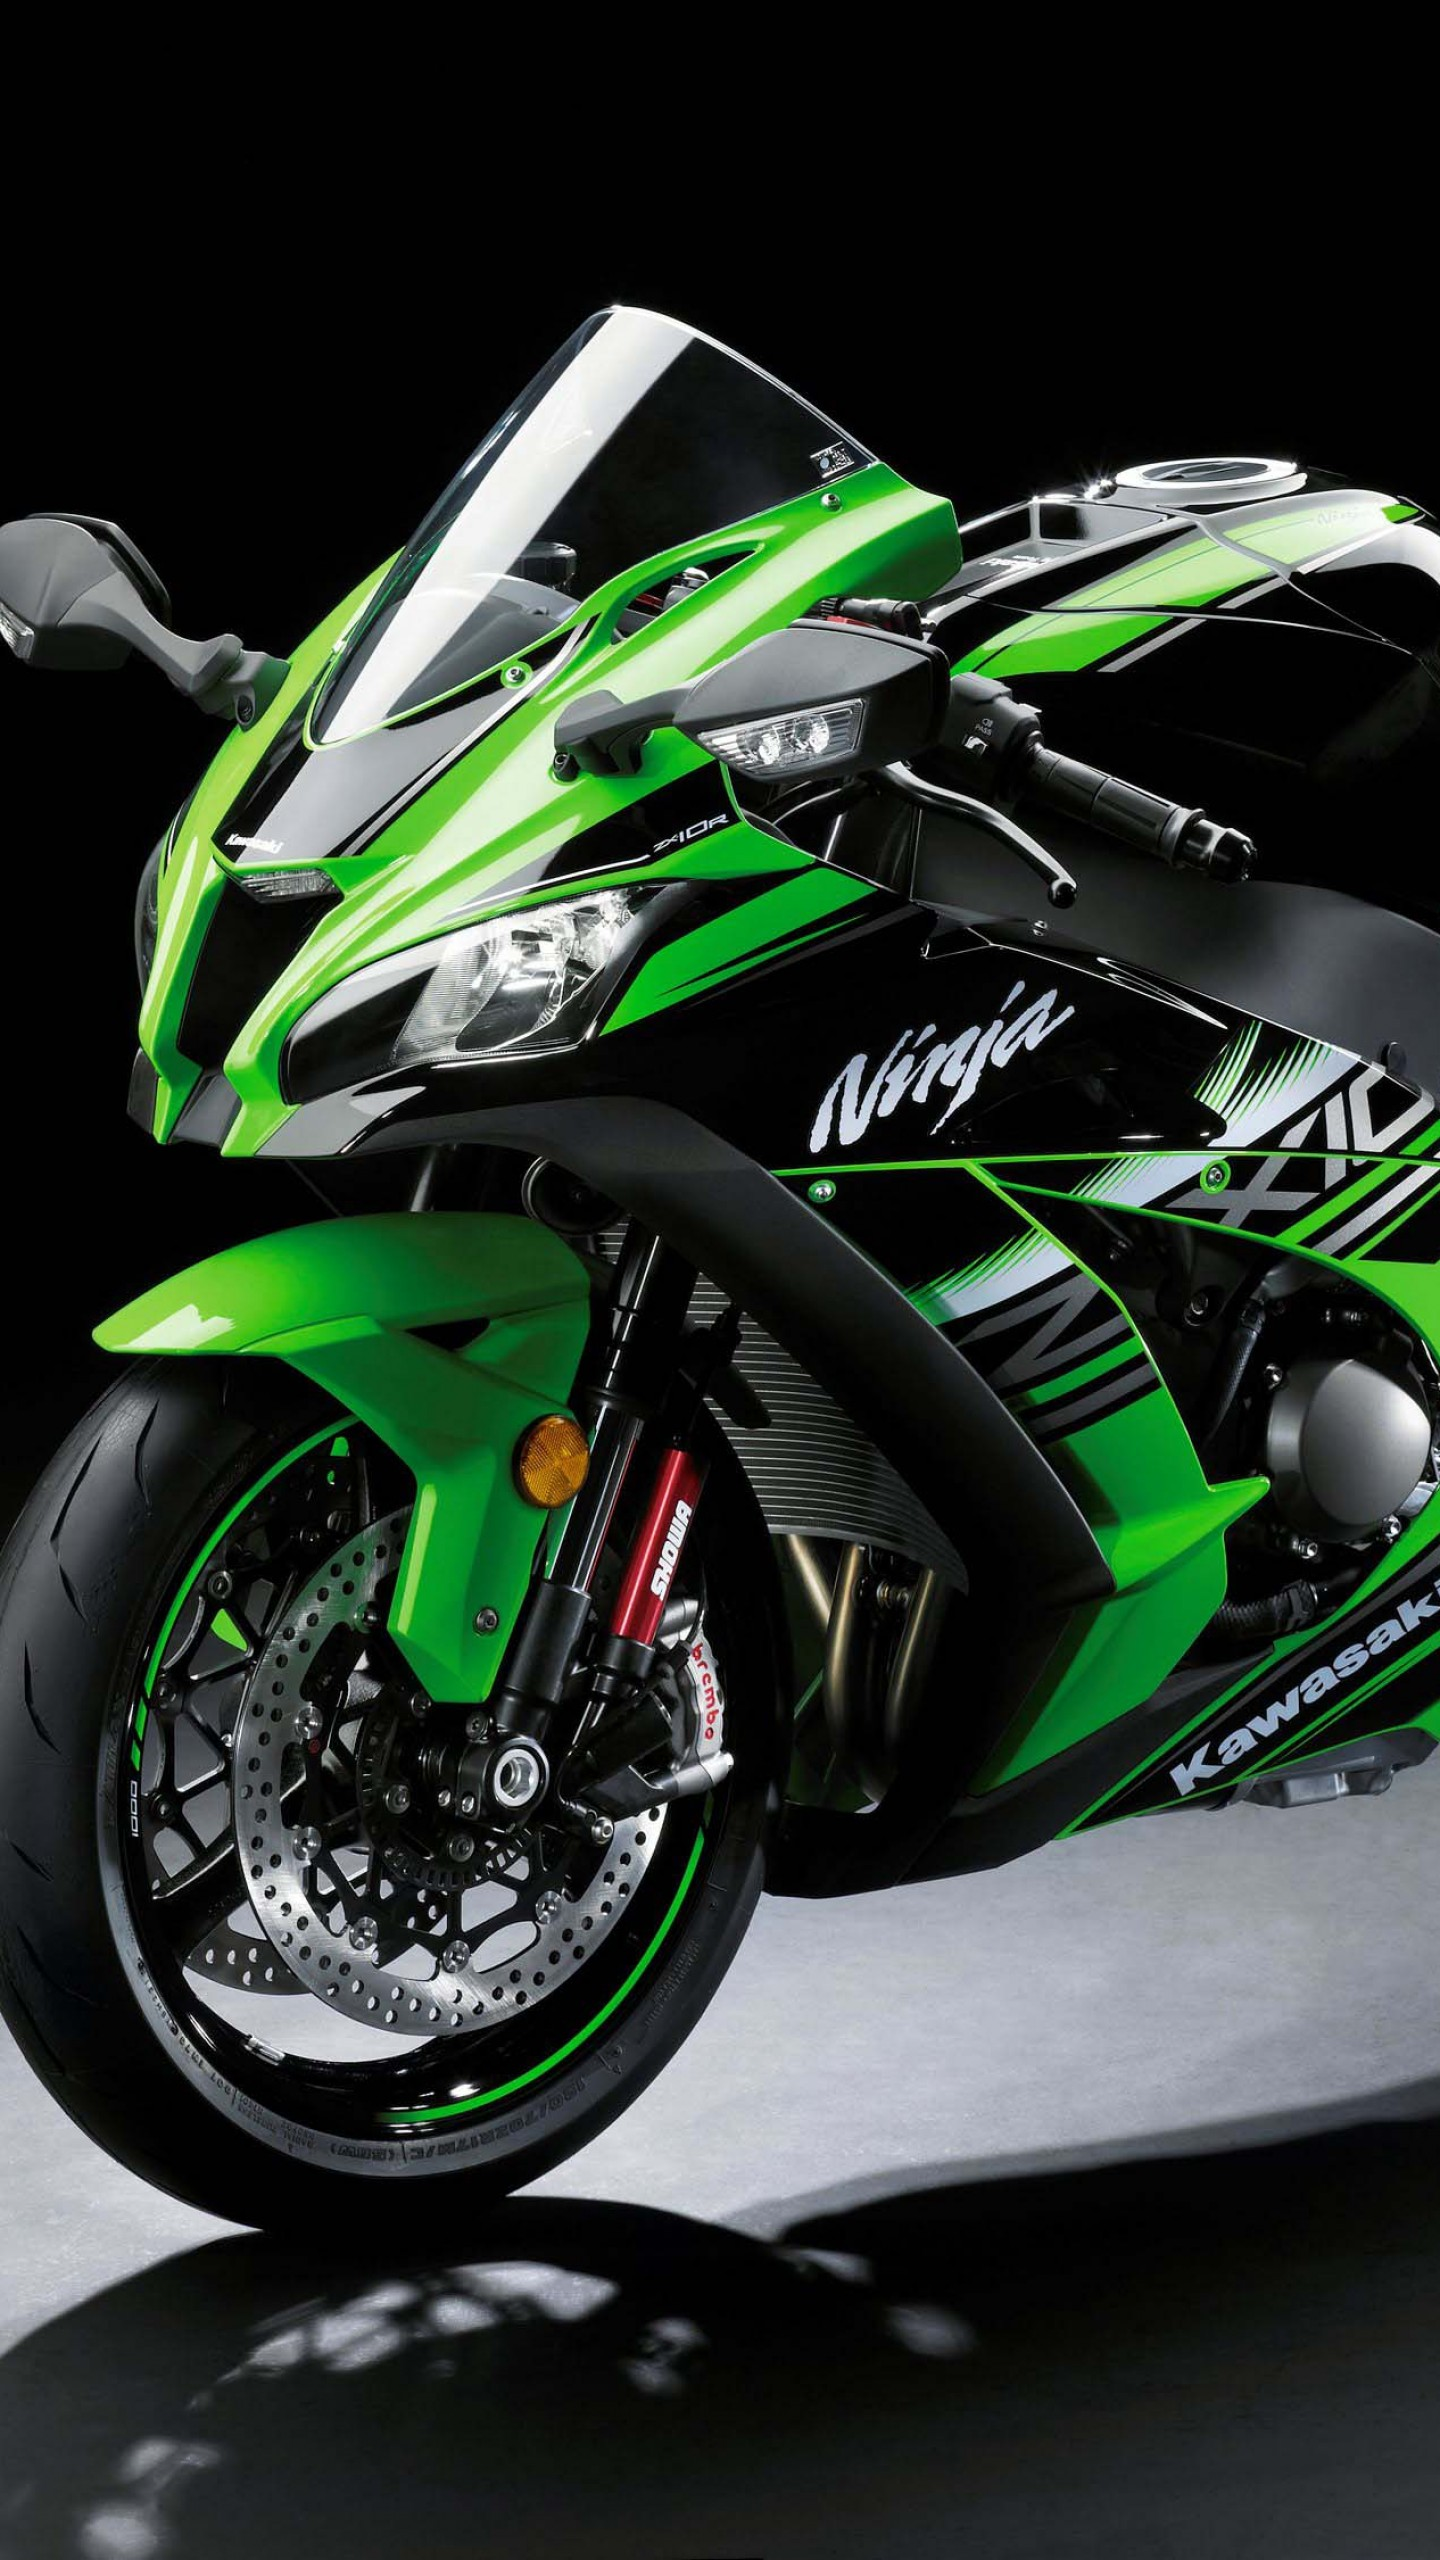 Wallpaper Kawasaki Zx 10r Intermot 2016 Worldsbk Green